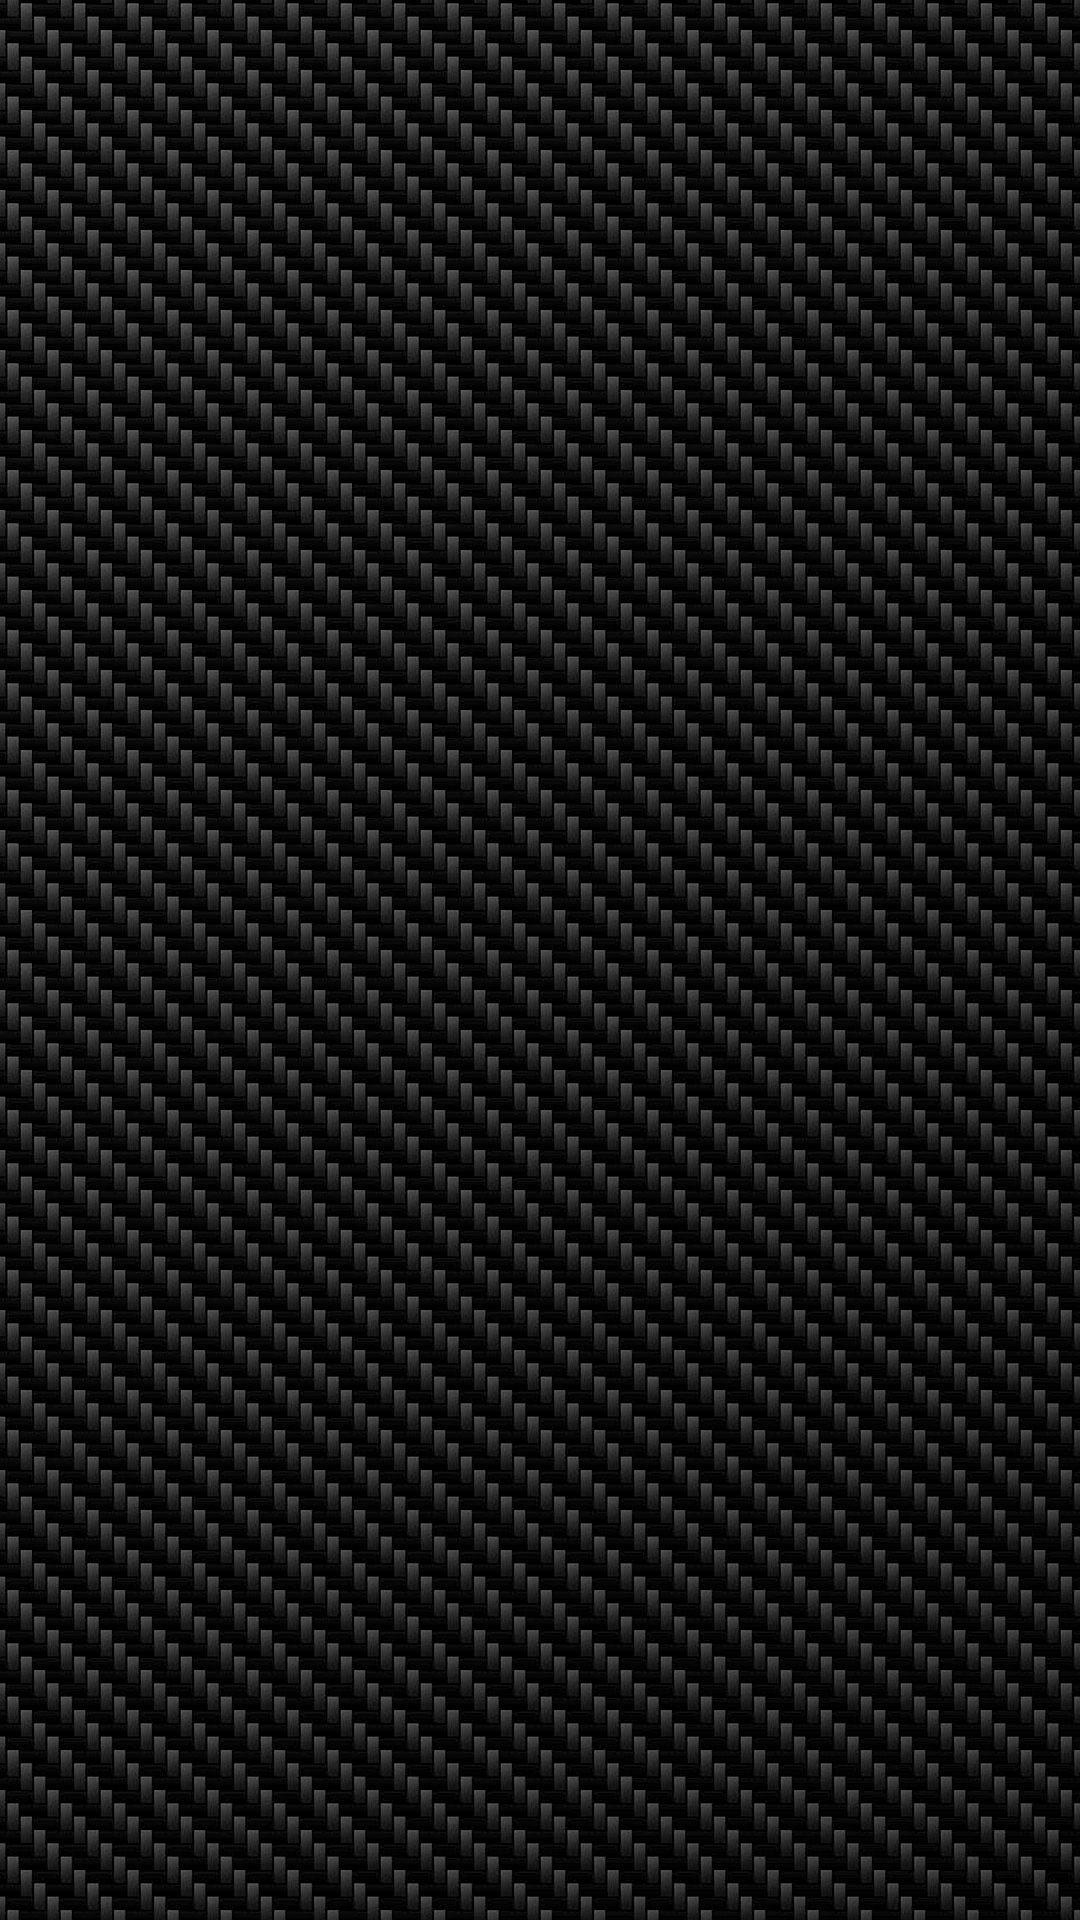 Carbon Fiber iPhone 6 Plus Wallpapers – carbon, fiber iPhone 6 .